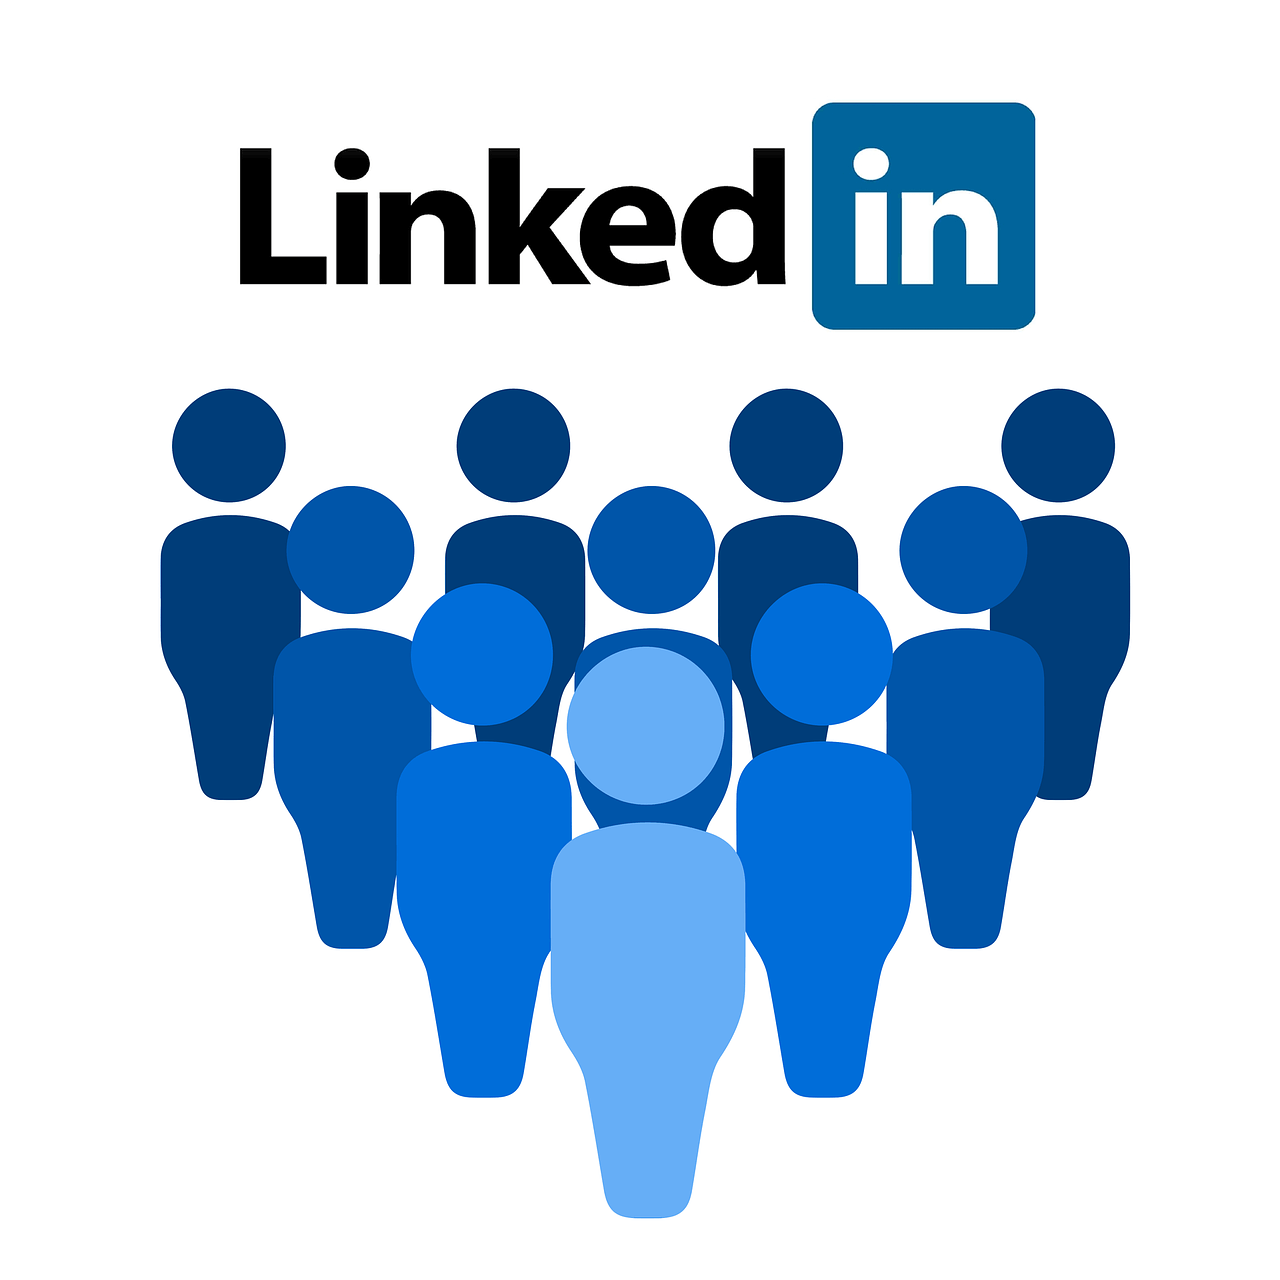 FortunaAdmissions.com, Fortuna Admissions LinkedIn strategy